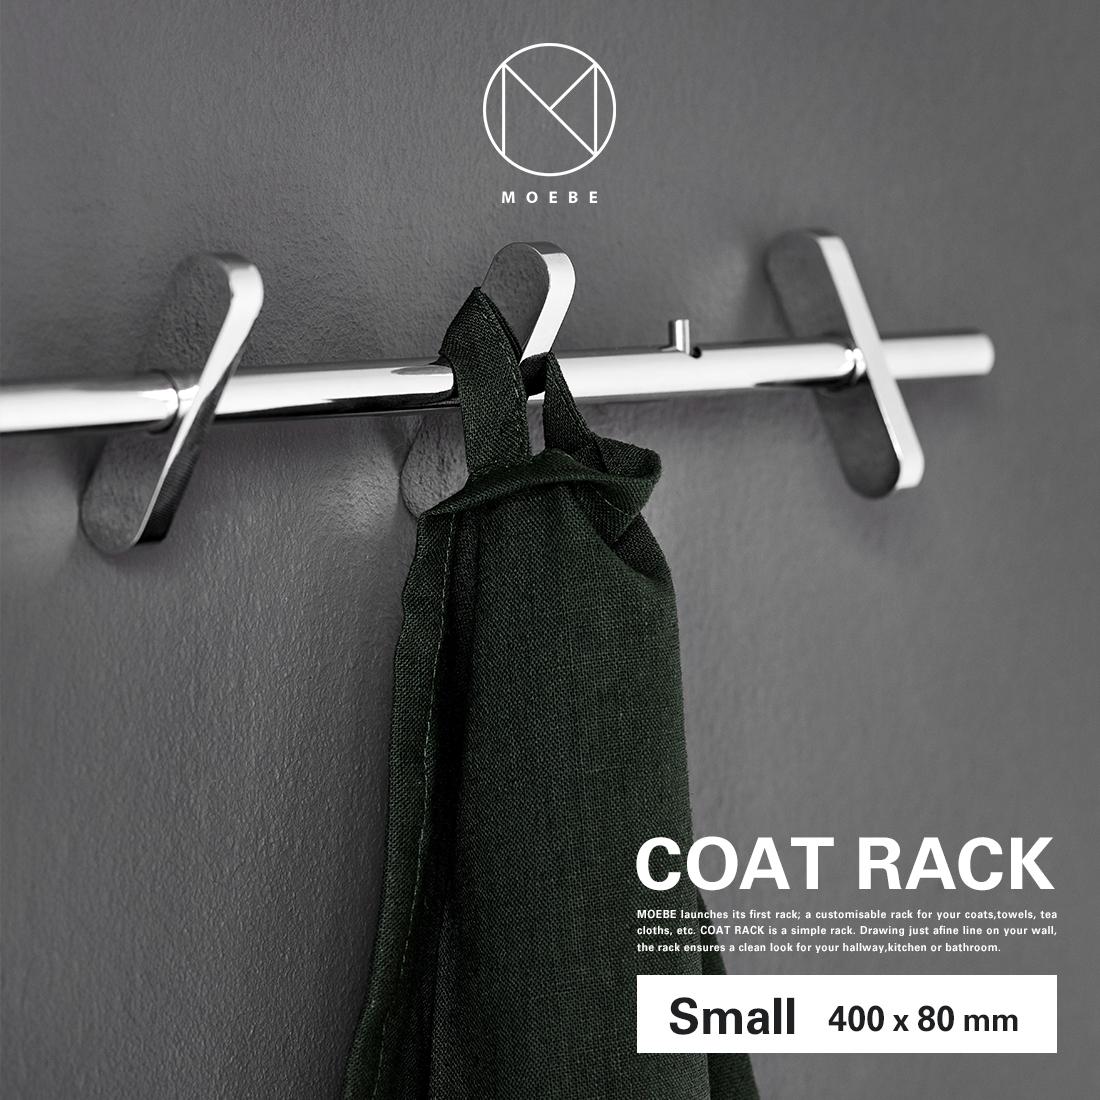 【MOEBE】COAT RACK S 40cm ムーベコートラック コートハンガー 壁掛け 玄関収納 スチール steel